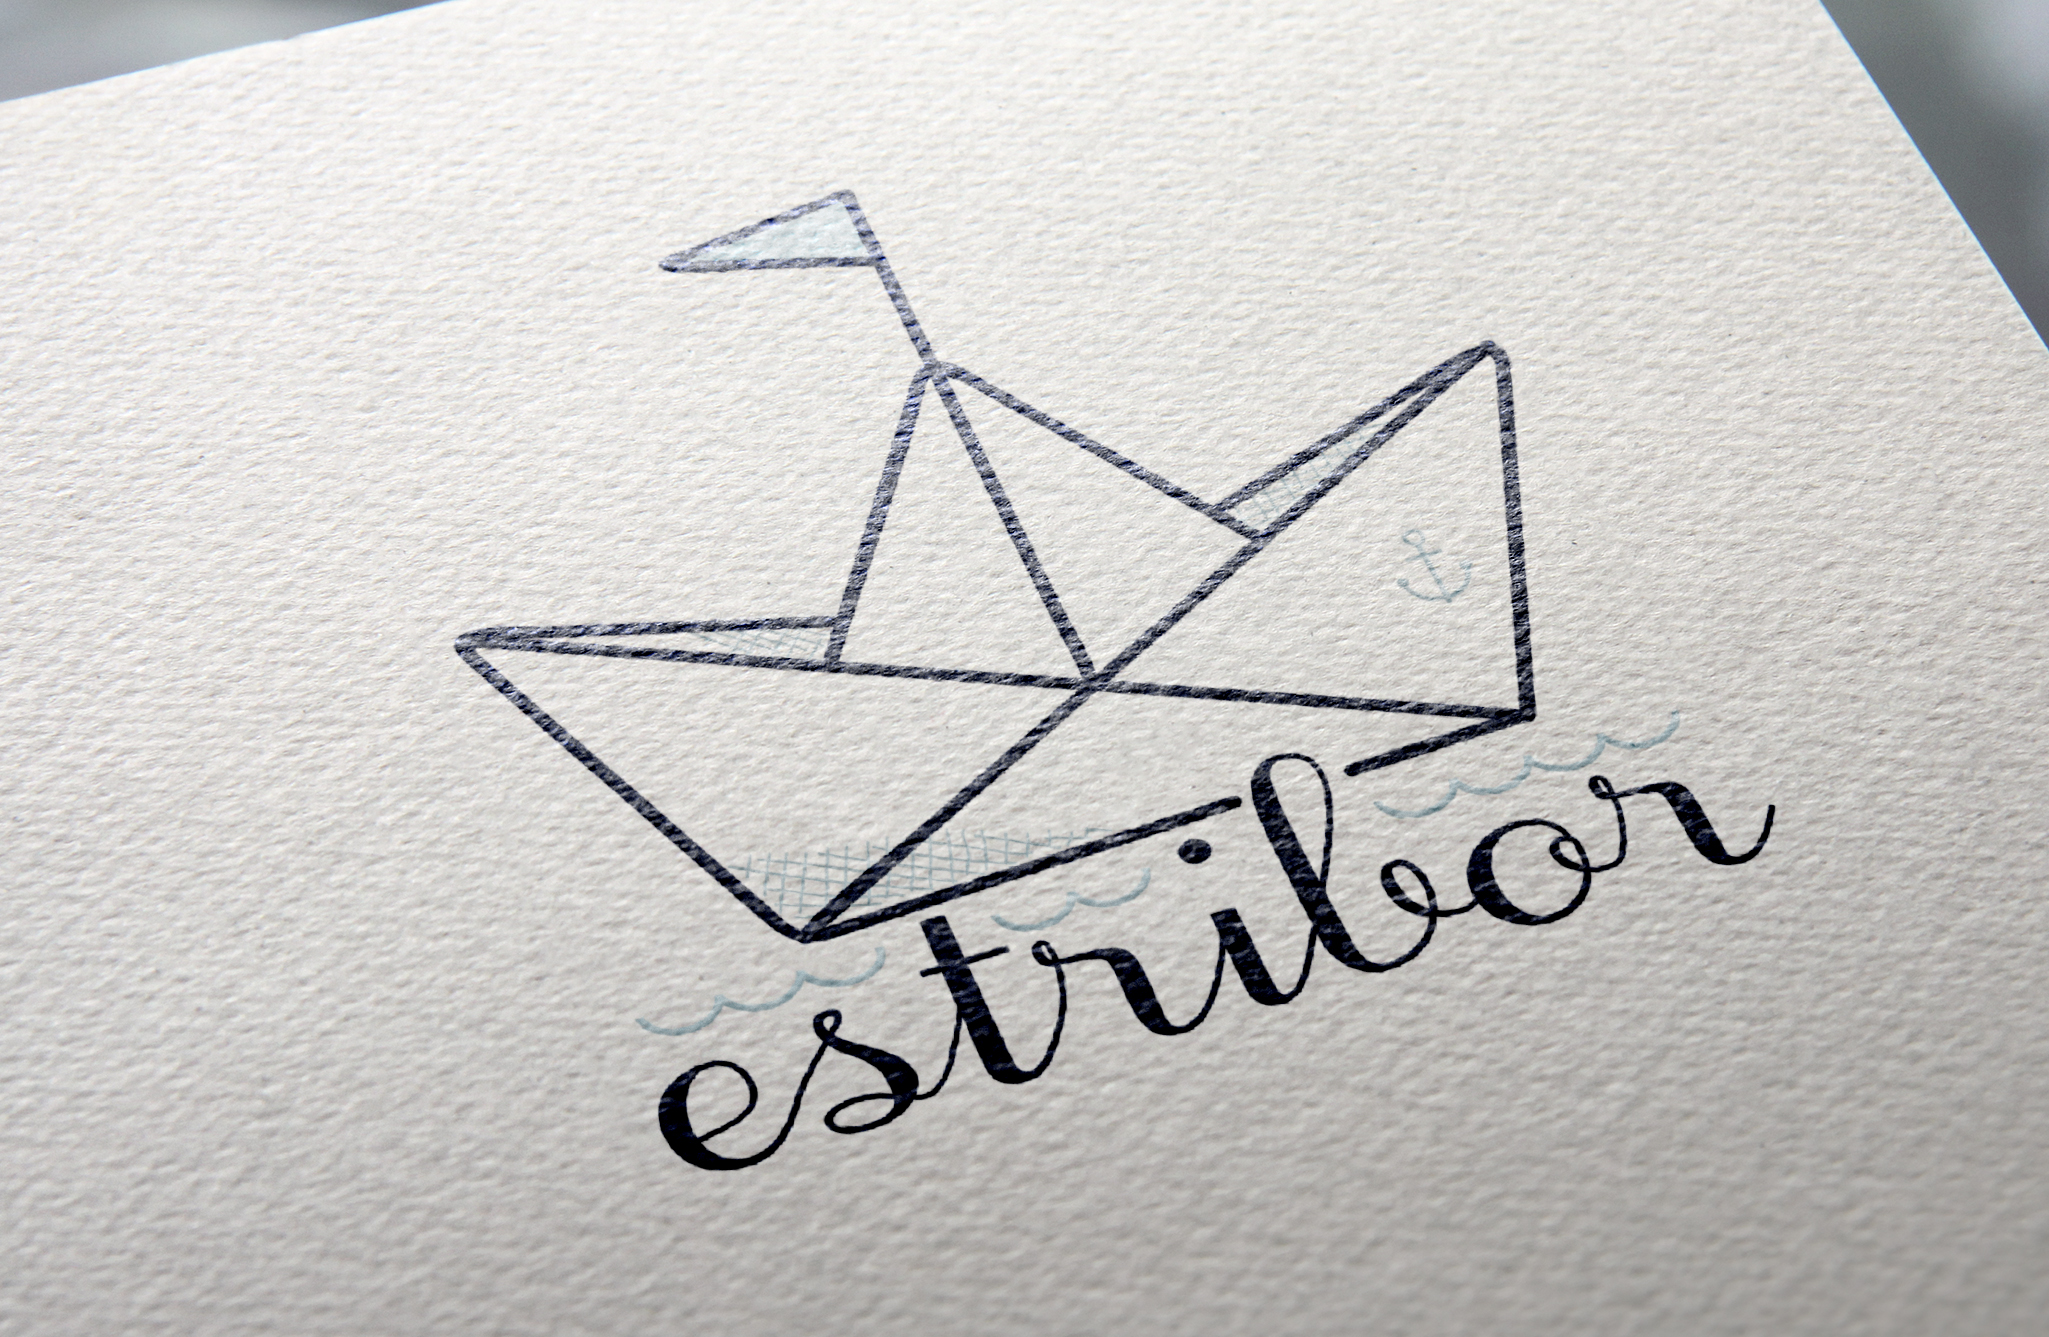 estribor5.jpg